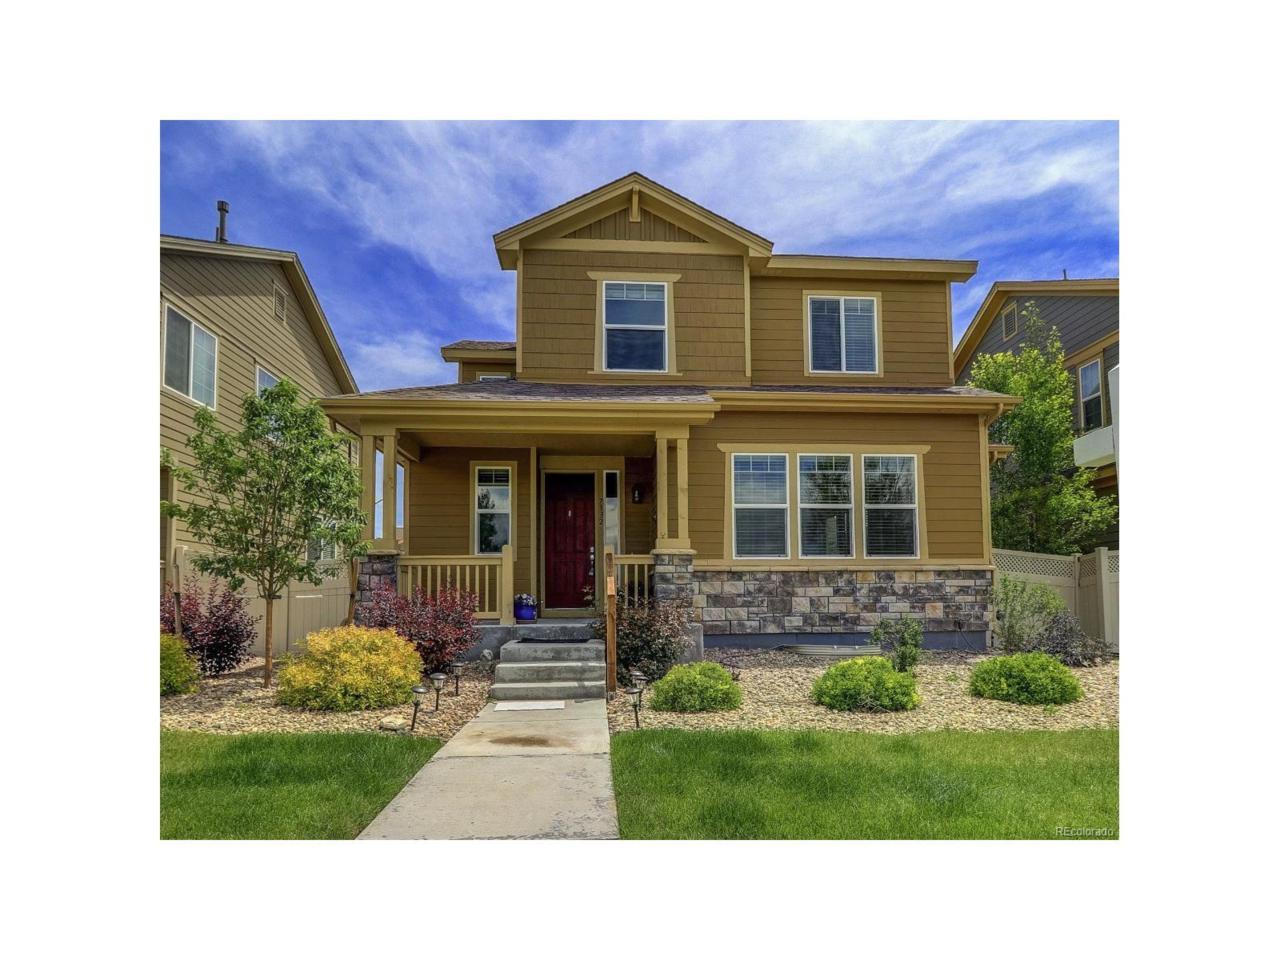 7332 Depew Street, Westminster, CO 80003 (MLS #2810012) :: 8z Real Estate